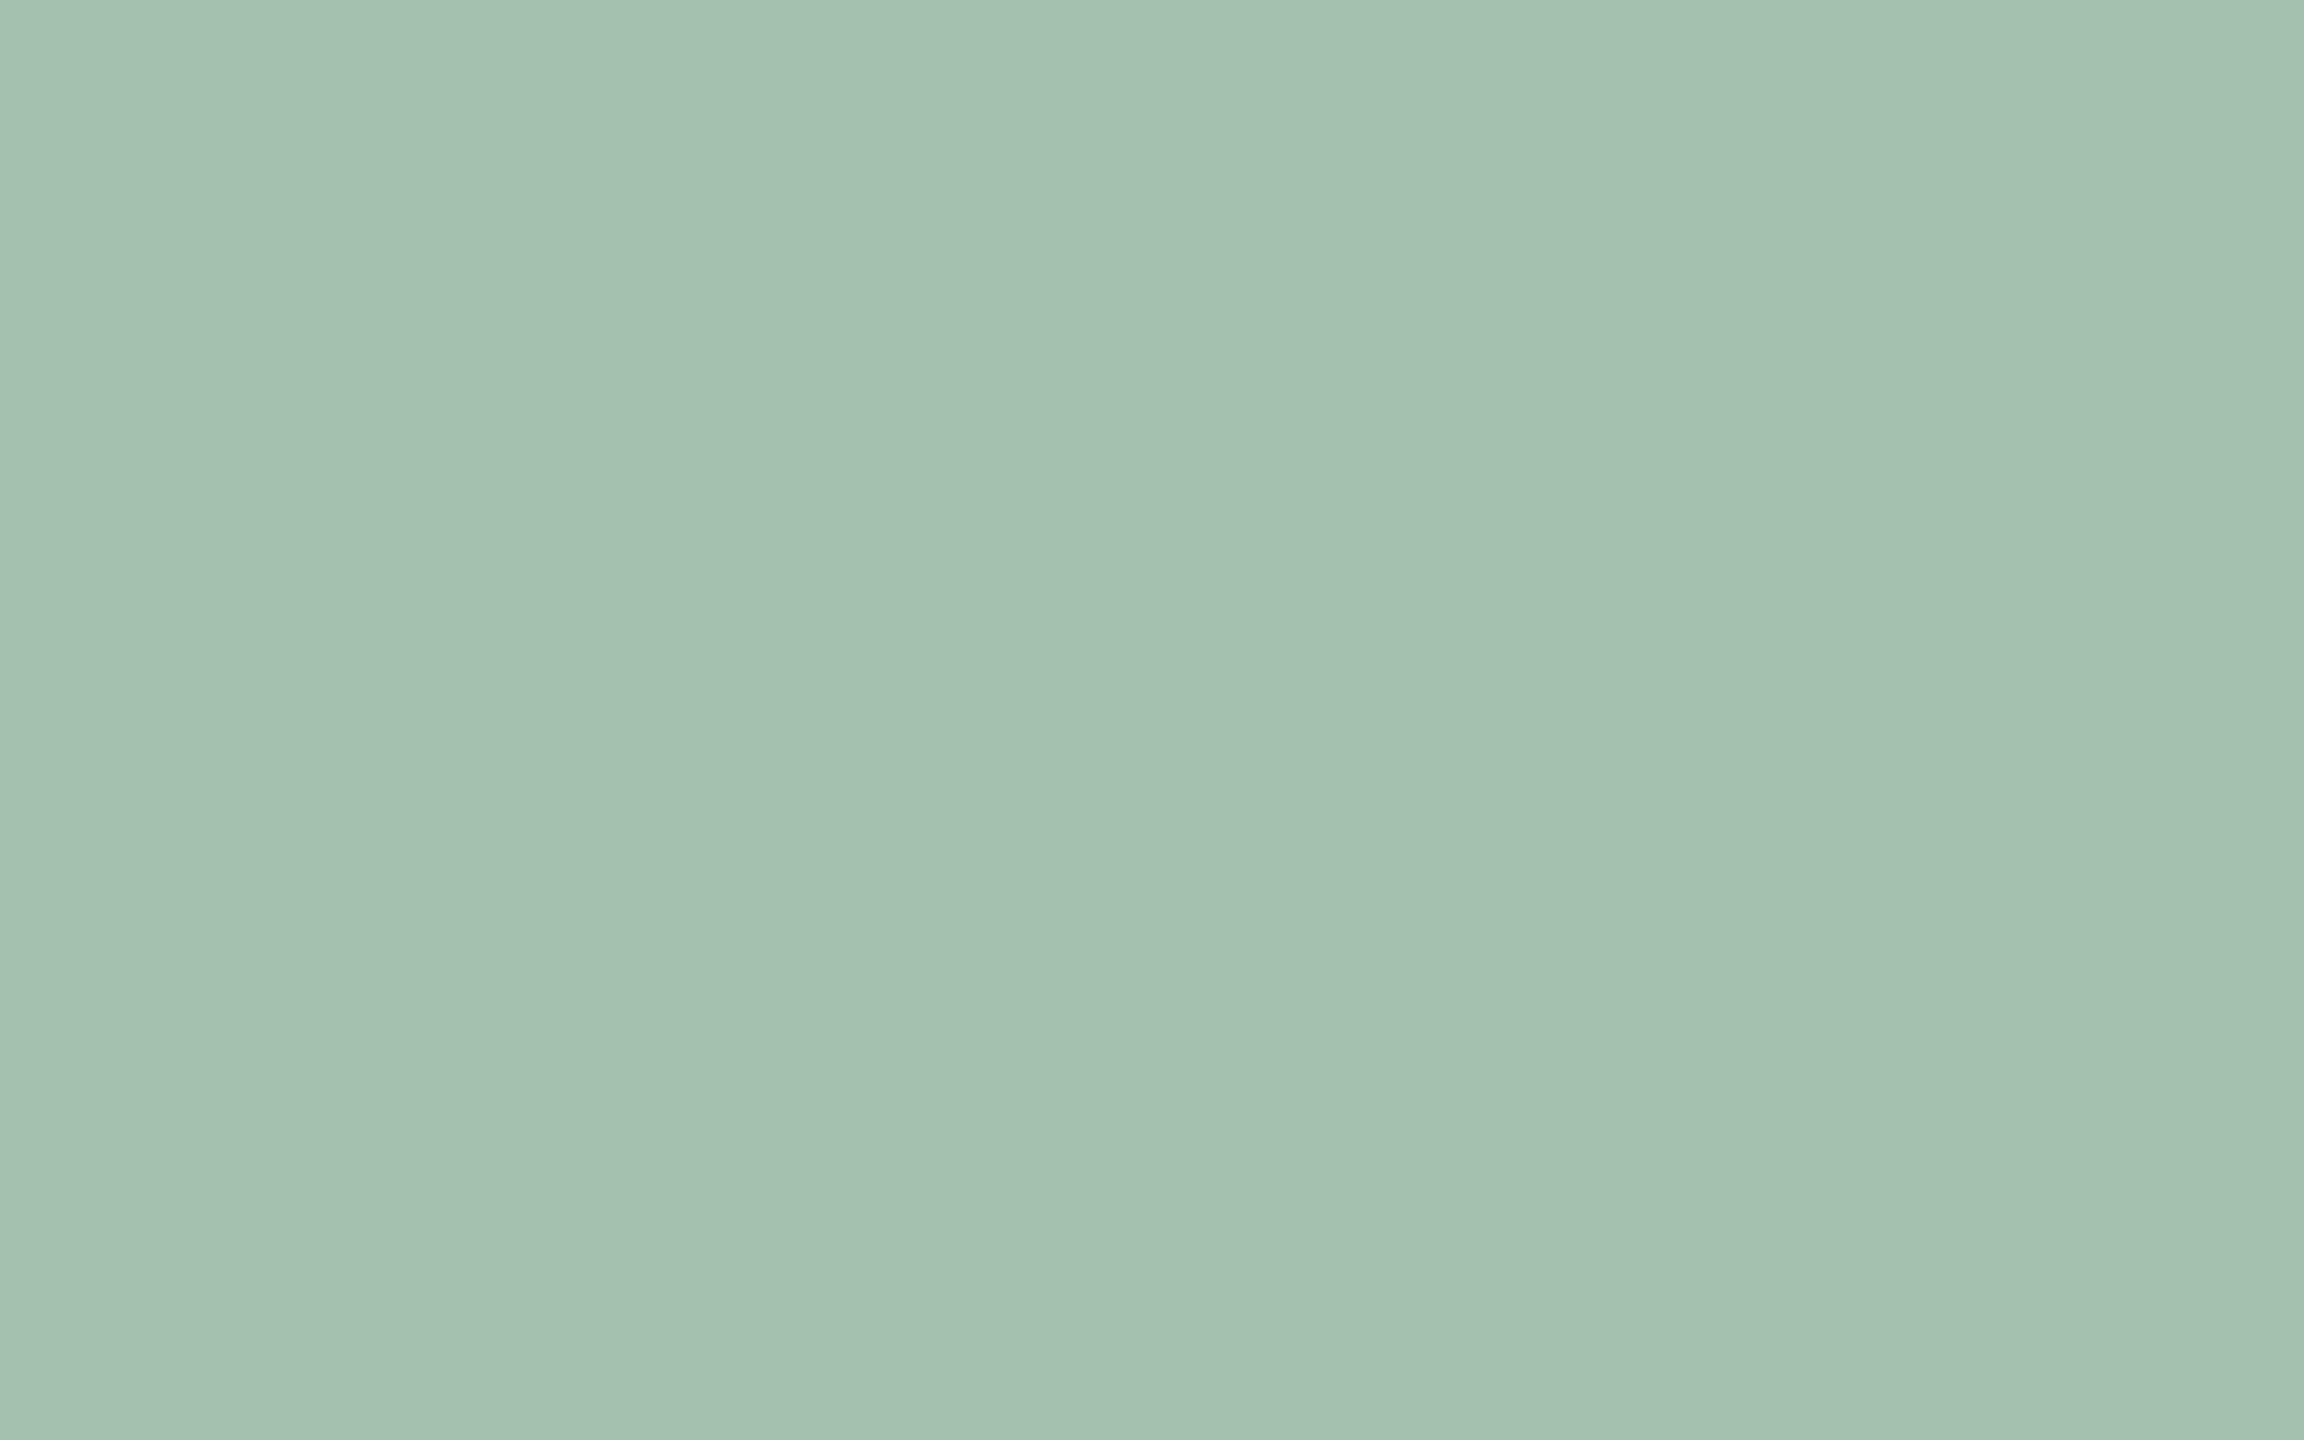 2304x1440 Cambridge Blue Solid Color Background